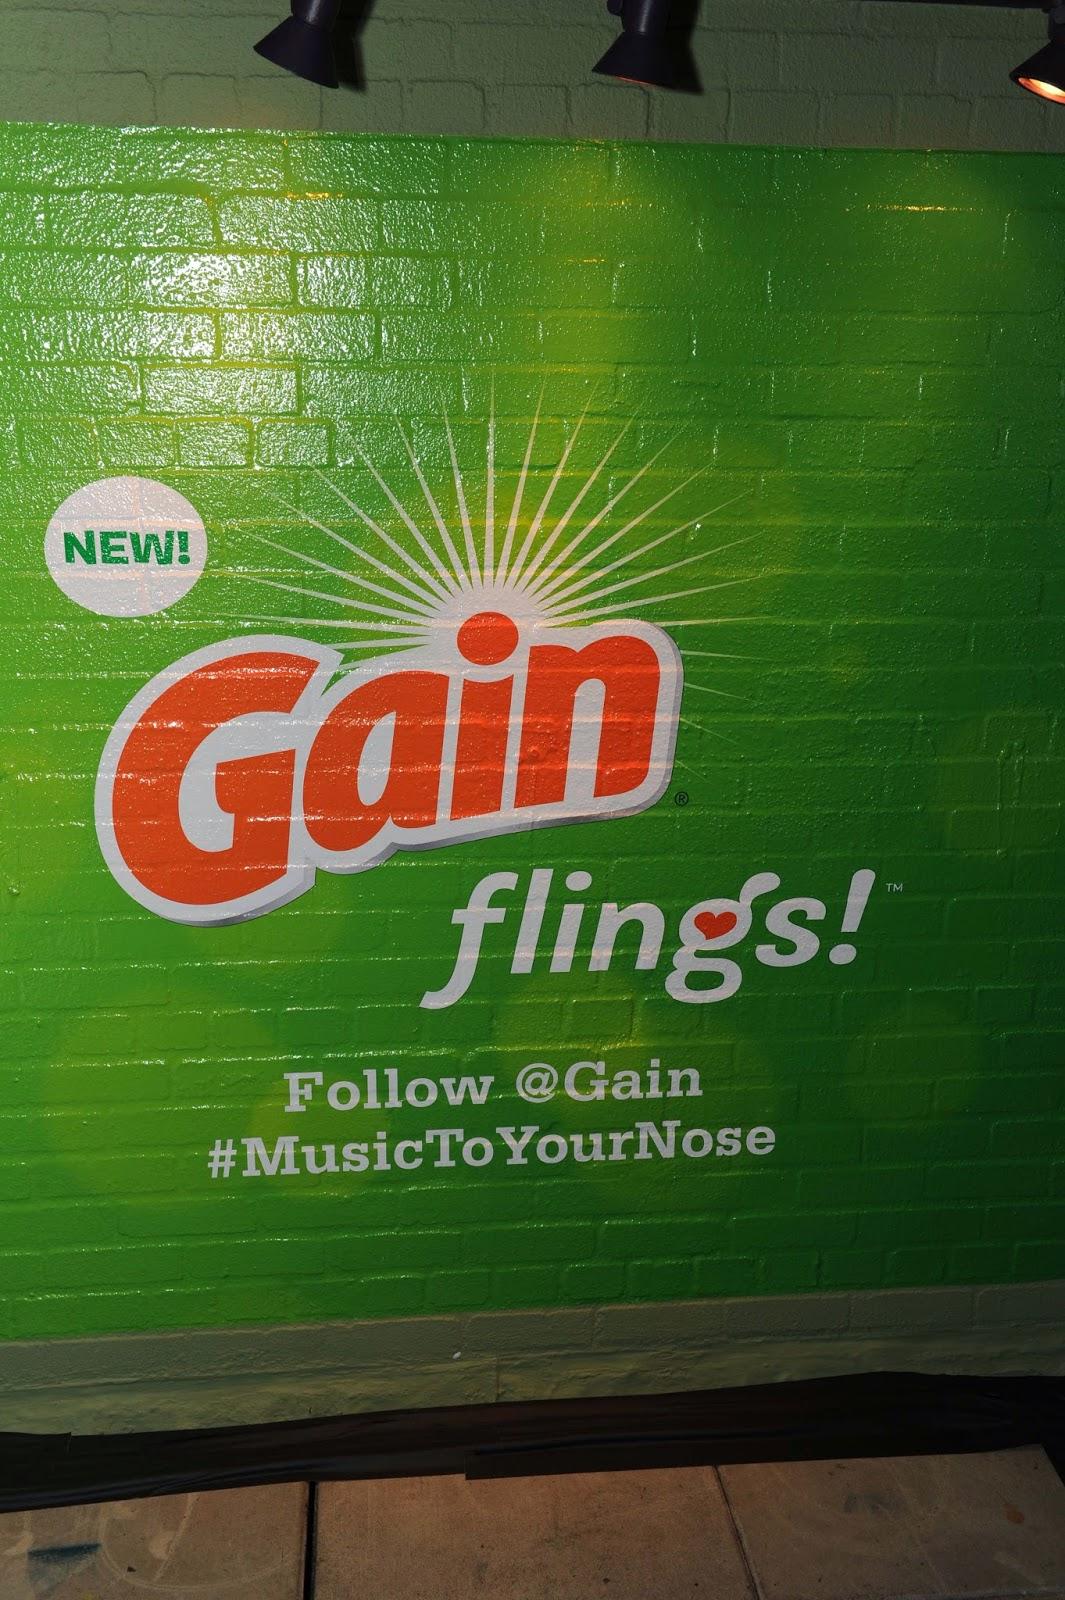 Gain Flings!, @Gain, #MusictoYourNose, #MusicaParaTuNariz